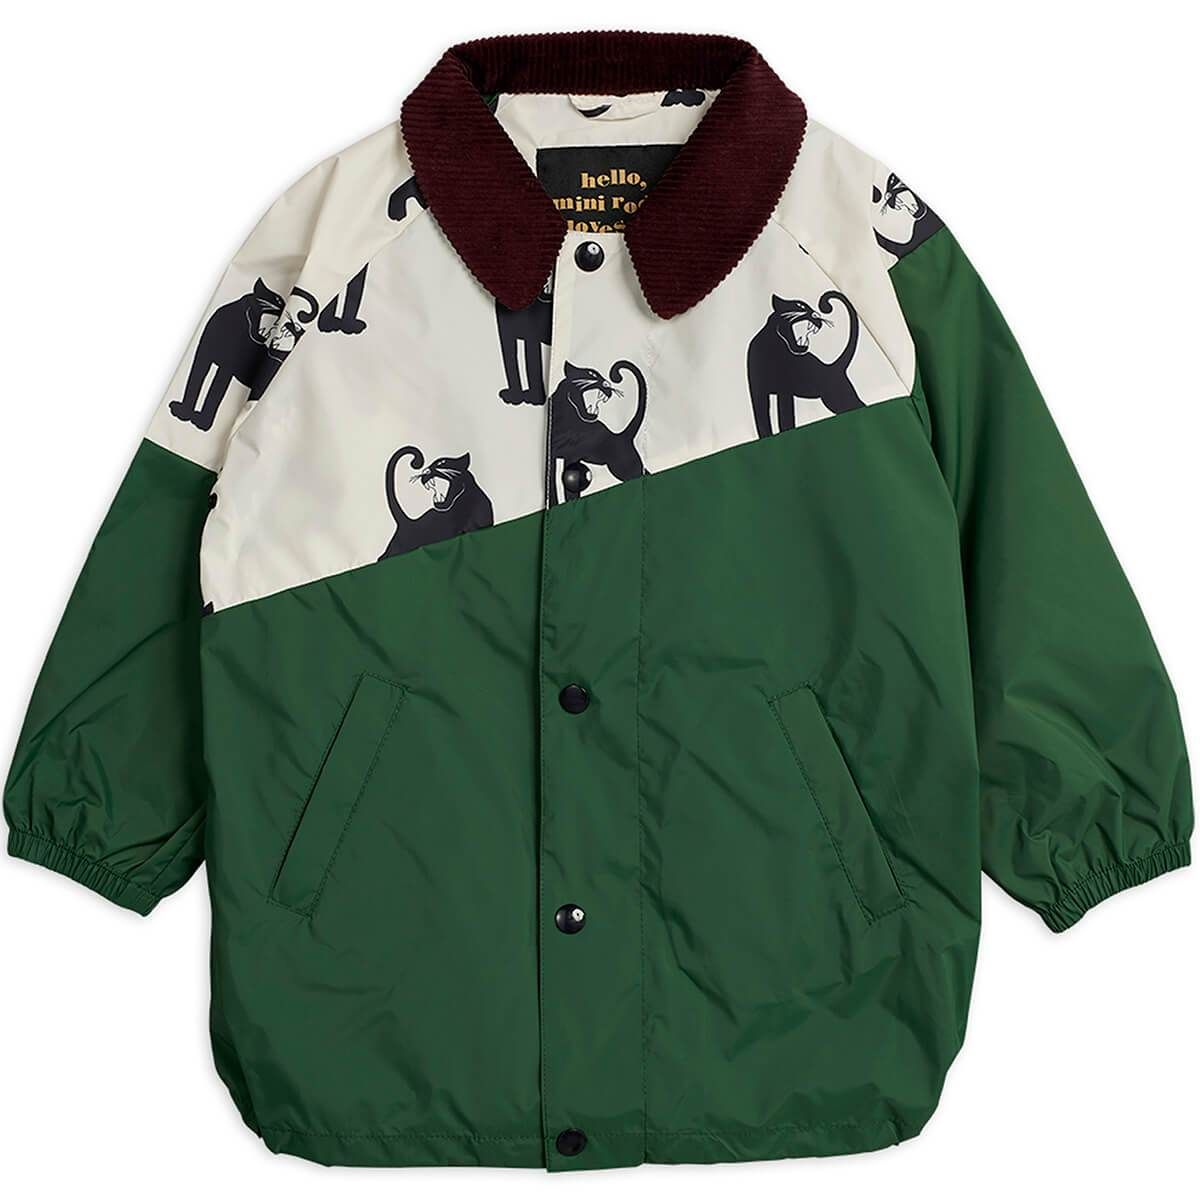 Children's Boys Spring Autumn Trench Coat Size 110 (Ready Stock)